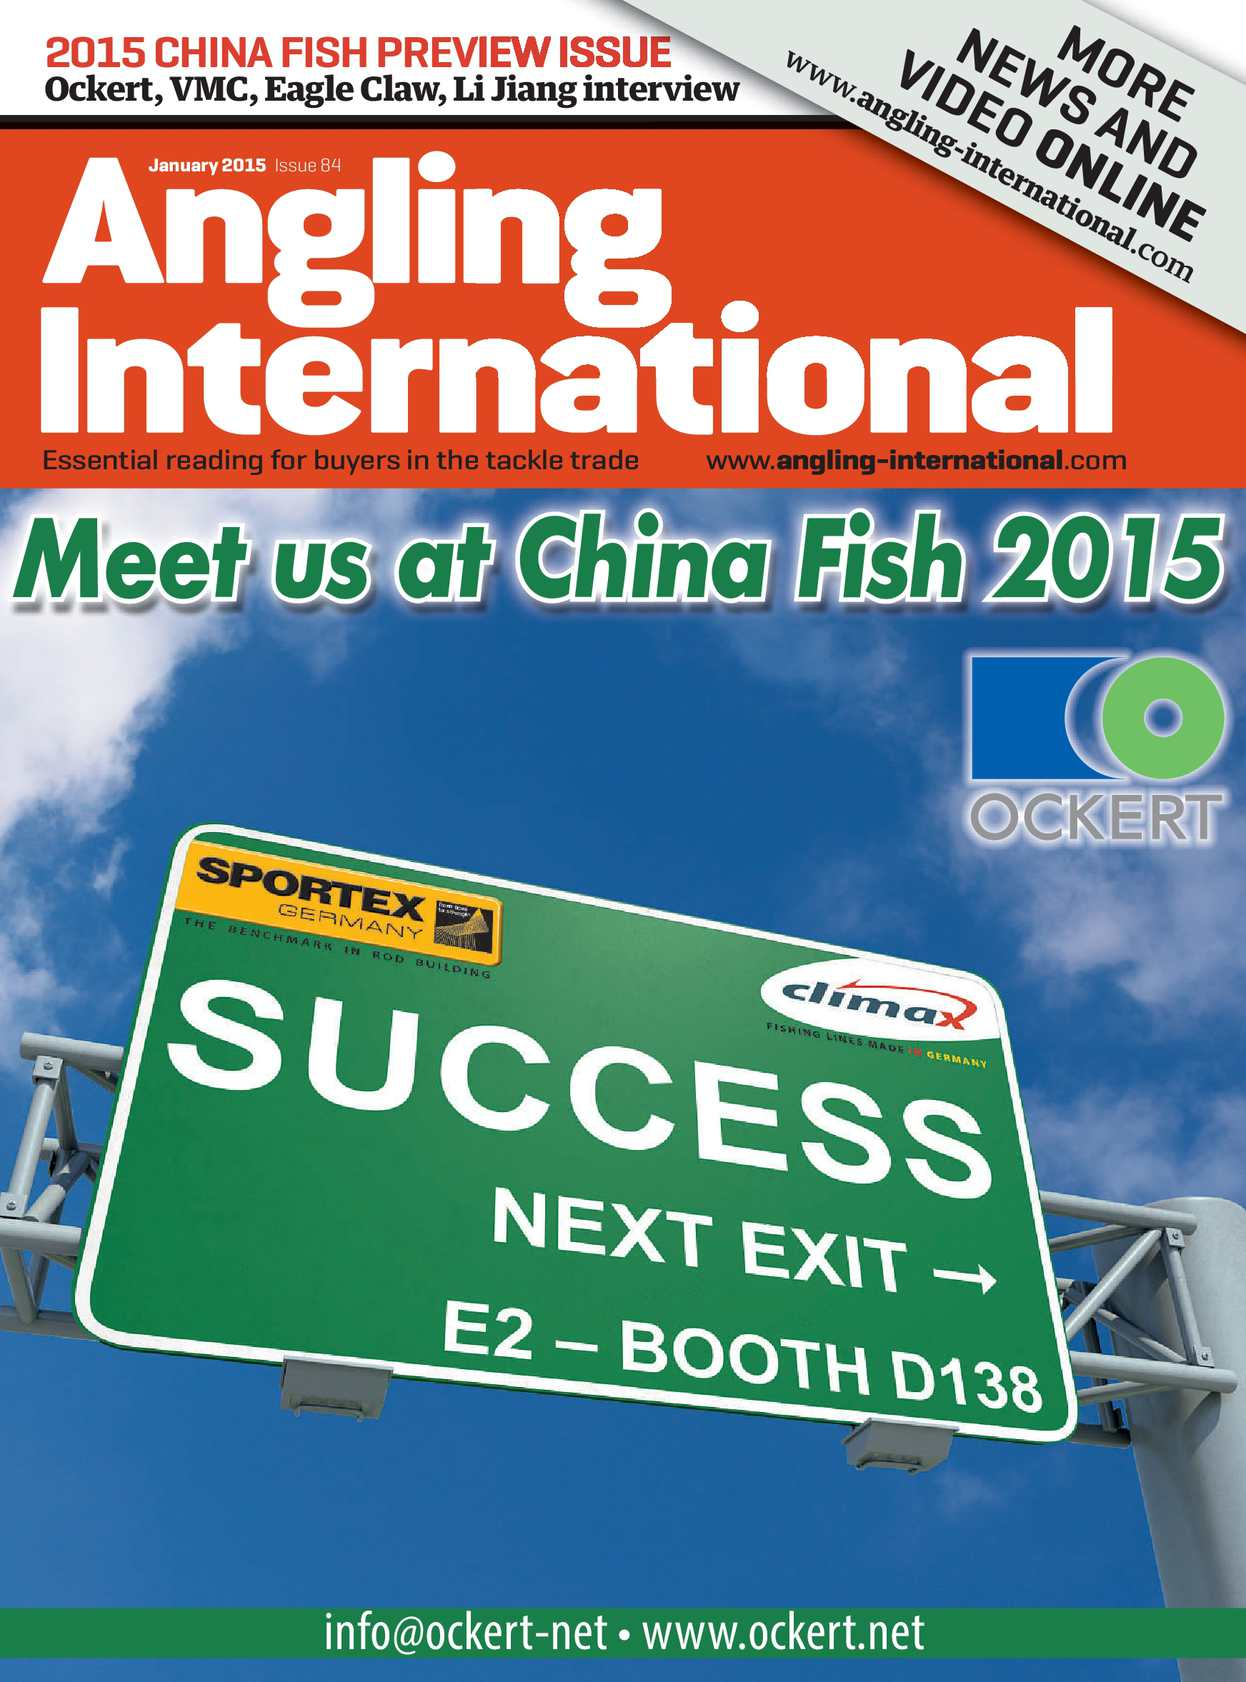 8de0728410 Calaméo - Angling International - January 2015 - Issue 84